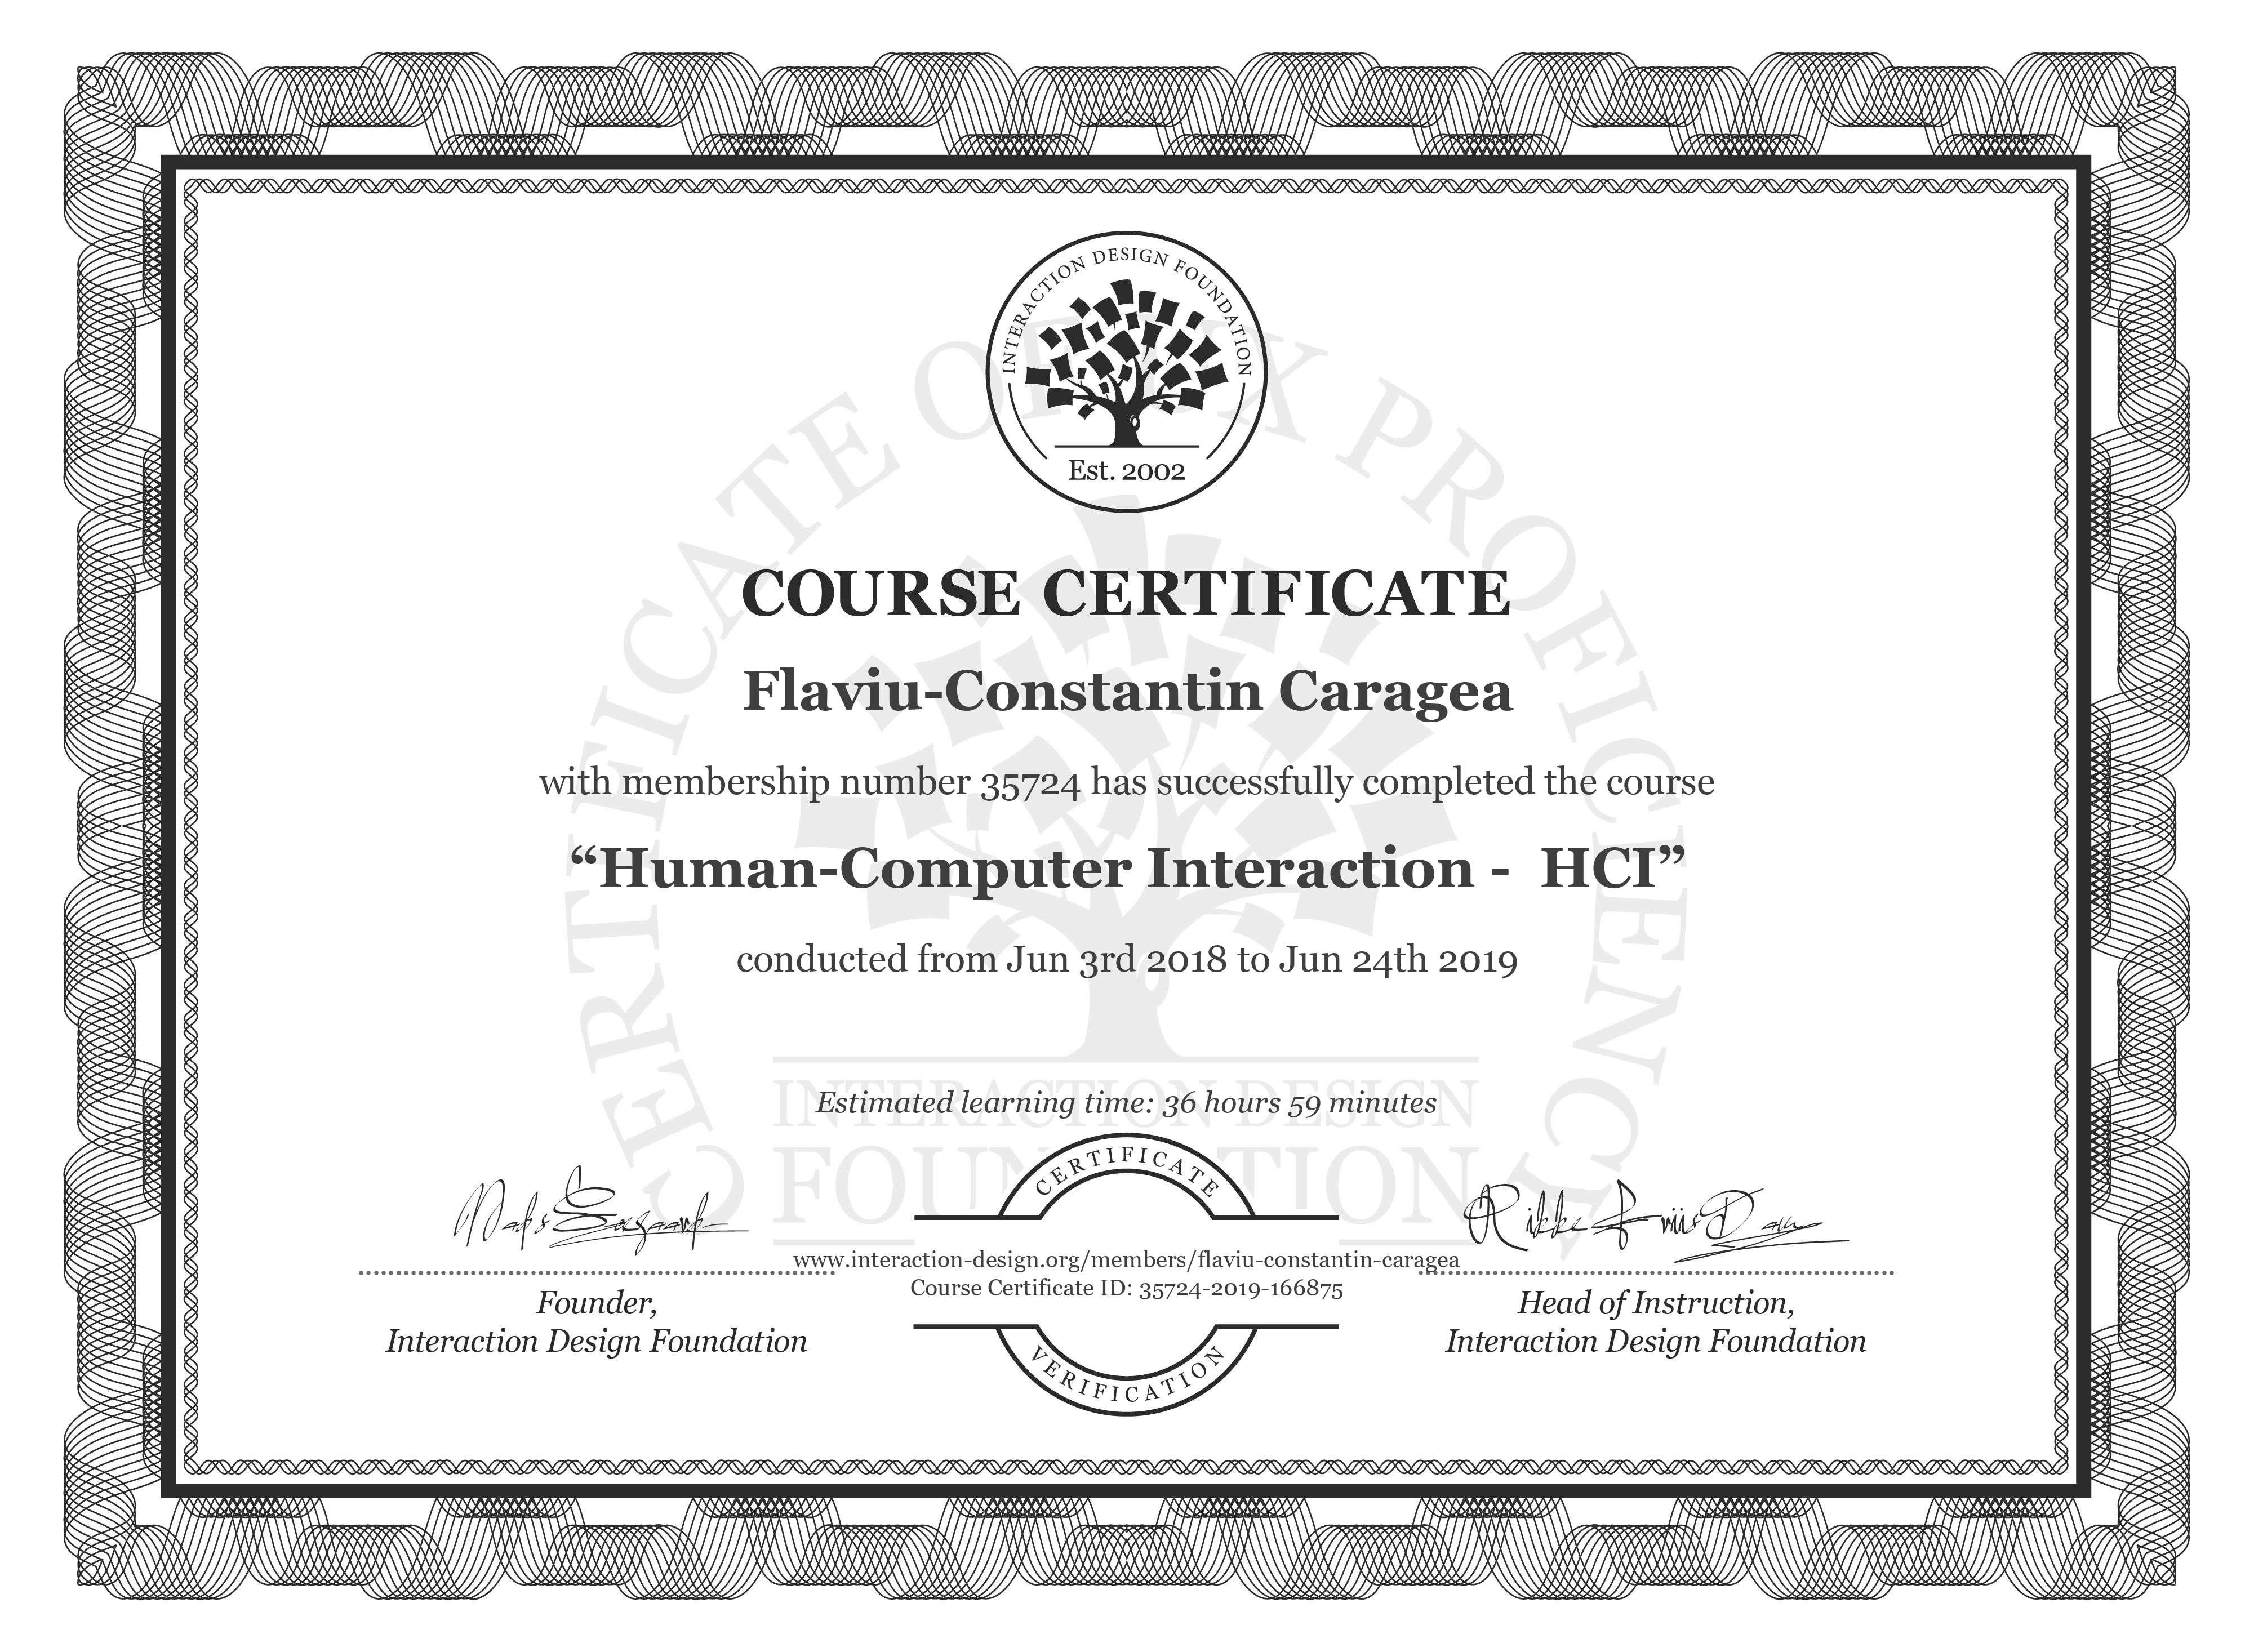 Flaviu-Constantin Caragea: Course Certificate - Human-Computer Interaction -  HCI